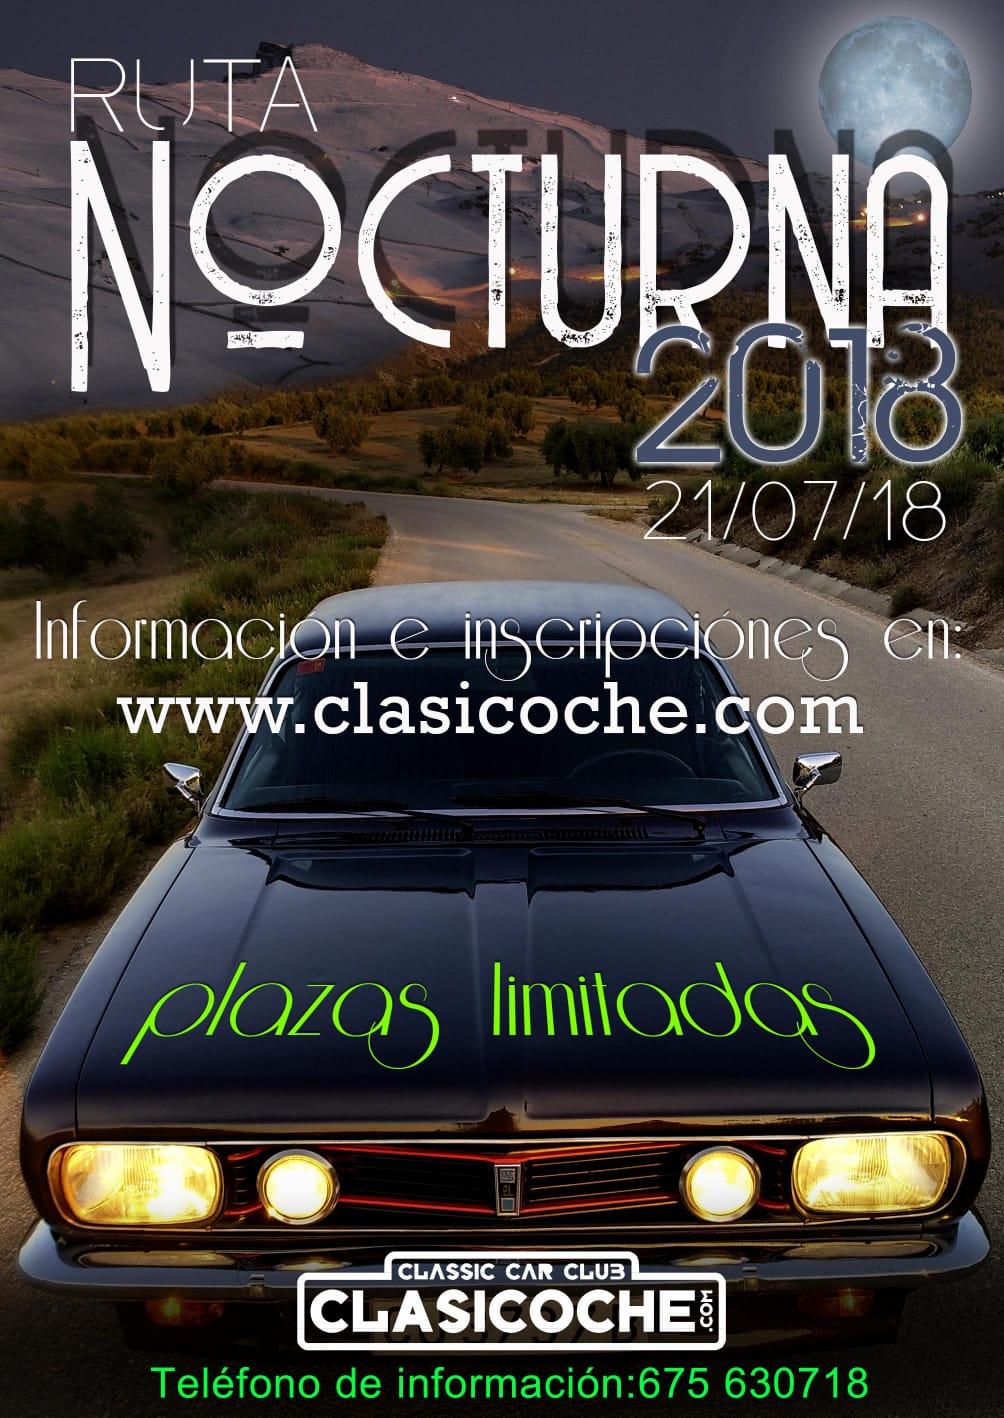 ••••••••• IX RUTA NOCTURNA CLASICOCHE  2018 ••••••••• 21-07-18 Whatsa11